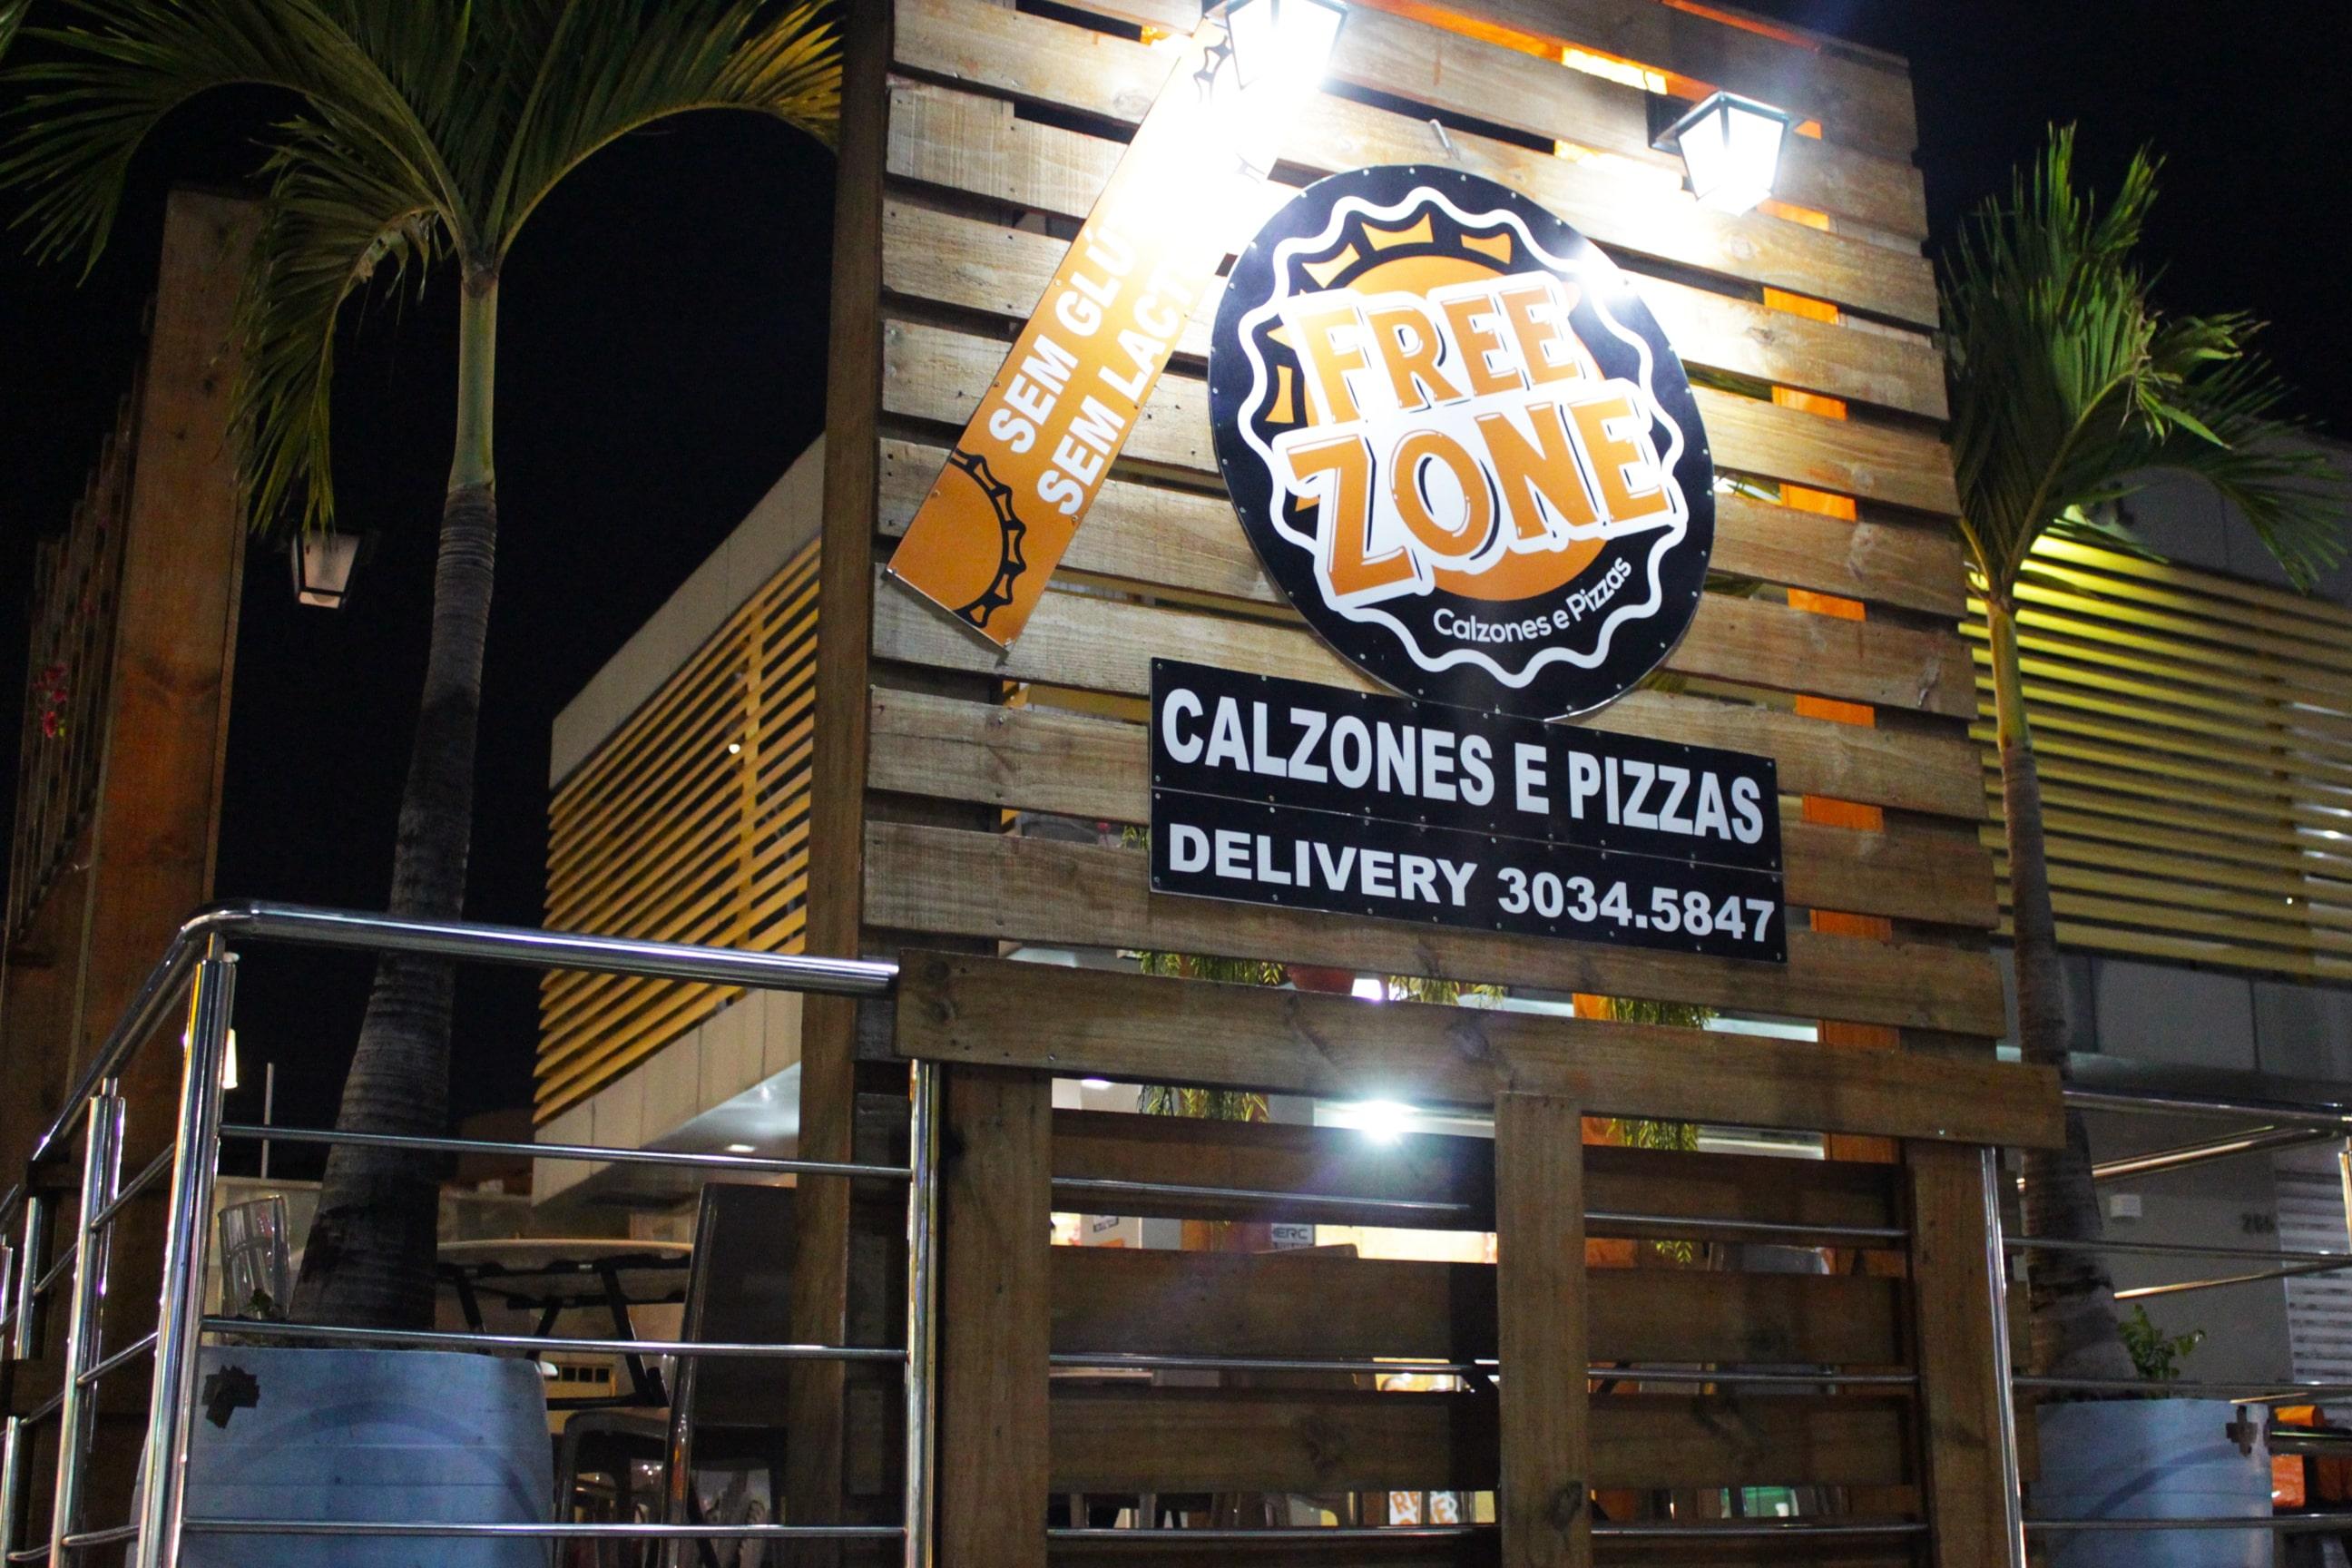 1 Pizza Grande de Calabresa (sem glúten) por apenas R$24,99